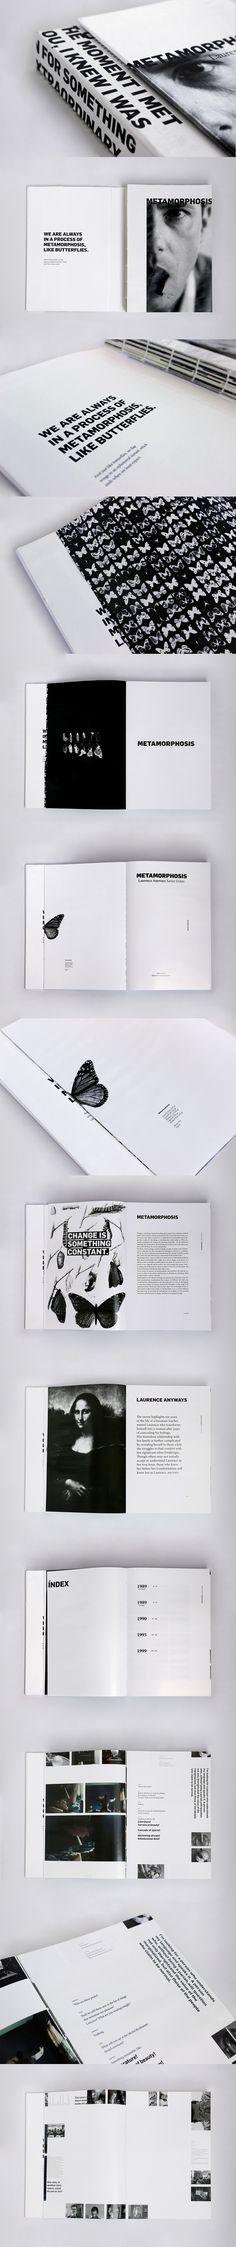 Ideas design editorial book texts for 2019 Layout Design, Game Design, Graphisches Design, Buch Design, Logo Design, Print Layout, Cover Design, Creative Design, Design Ideas